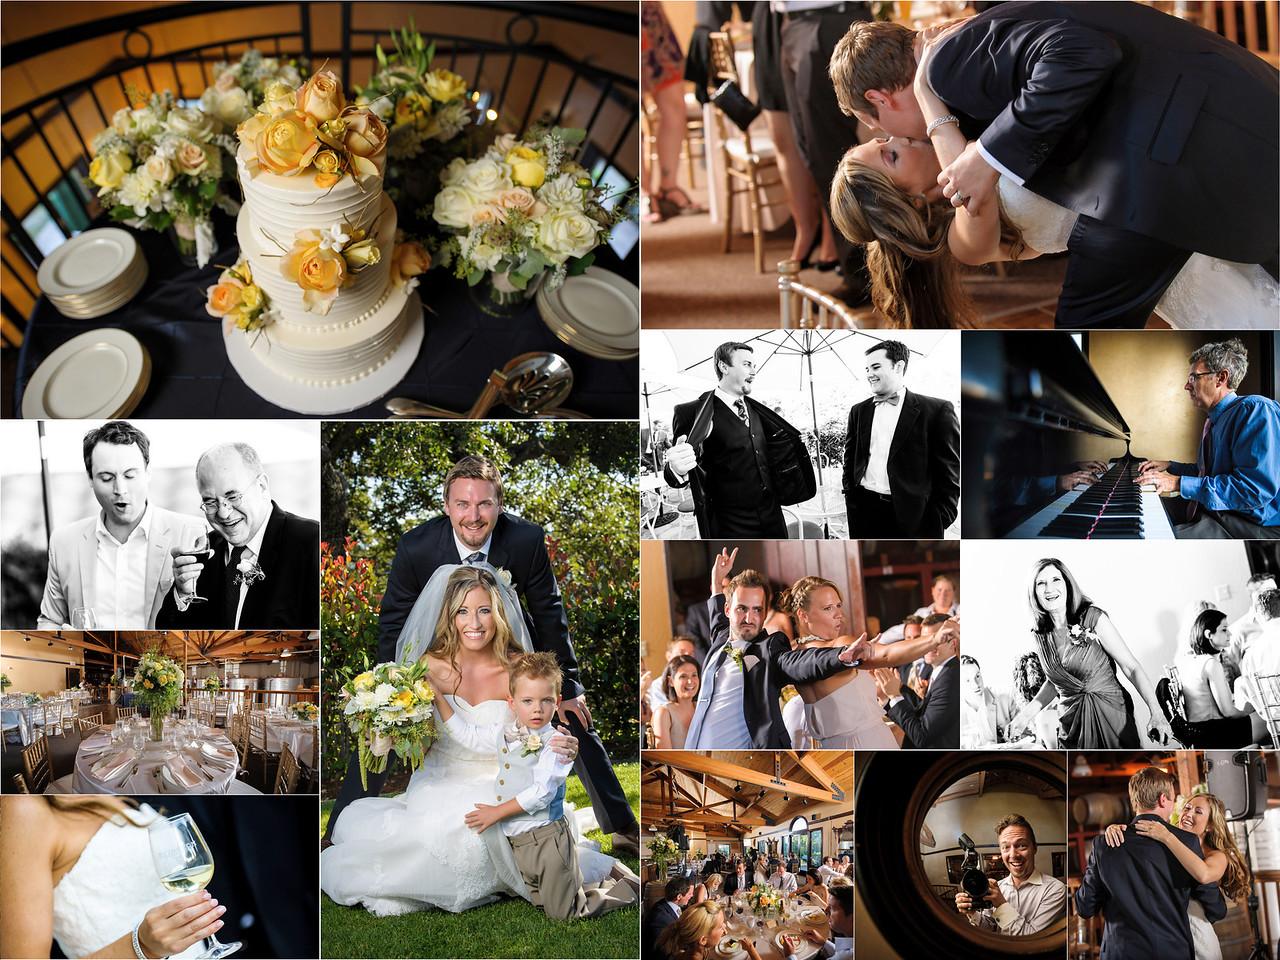 Erica_and_Justin_Byington_Winery_Los_Gatos_Wedding_Photography_4x6_Photo_Board_06